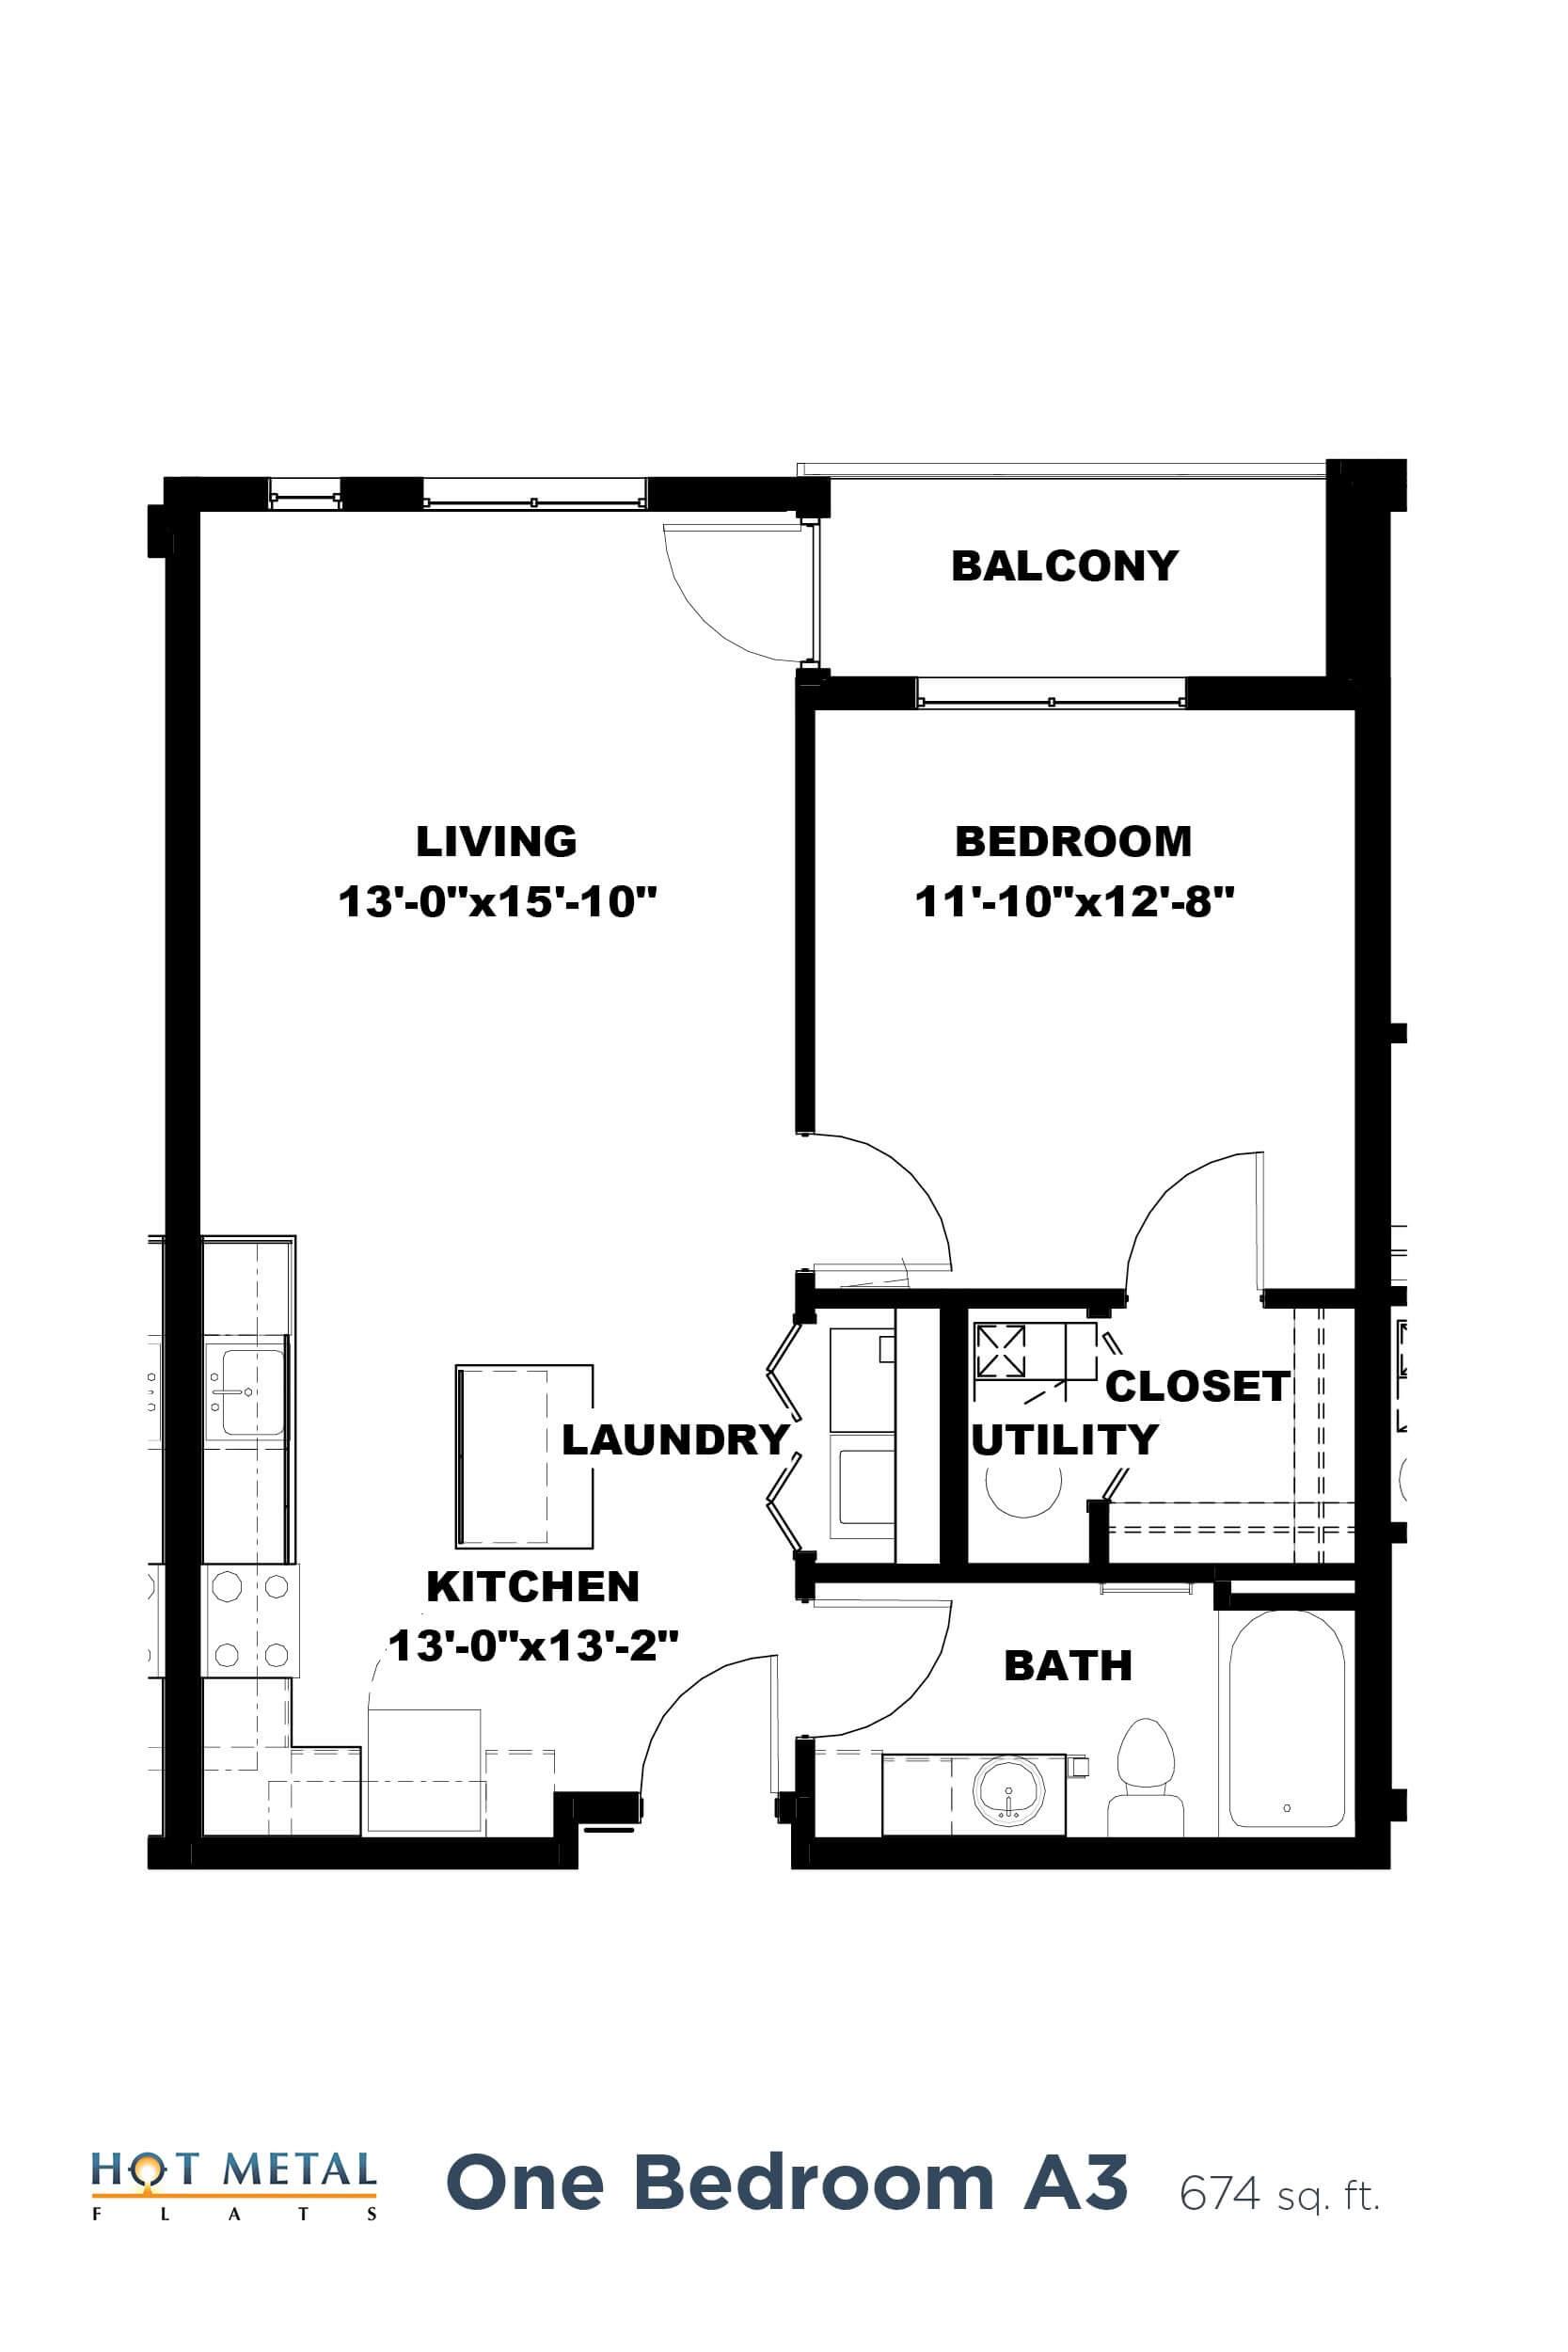 Floor Plan  Hot Metal Flats A3 floorplan, Hot Metal Flats apartments, Pittsburgh, PA, opens a dialog